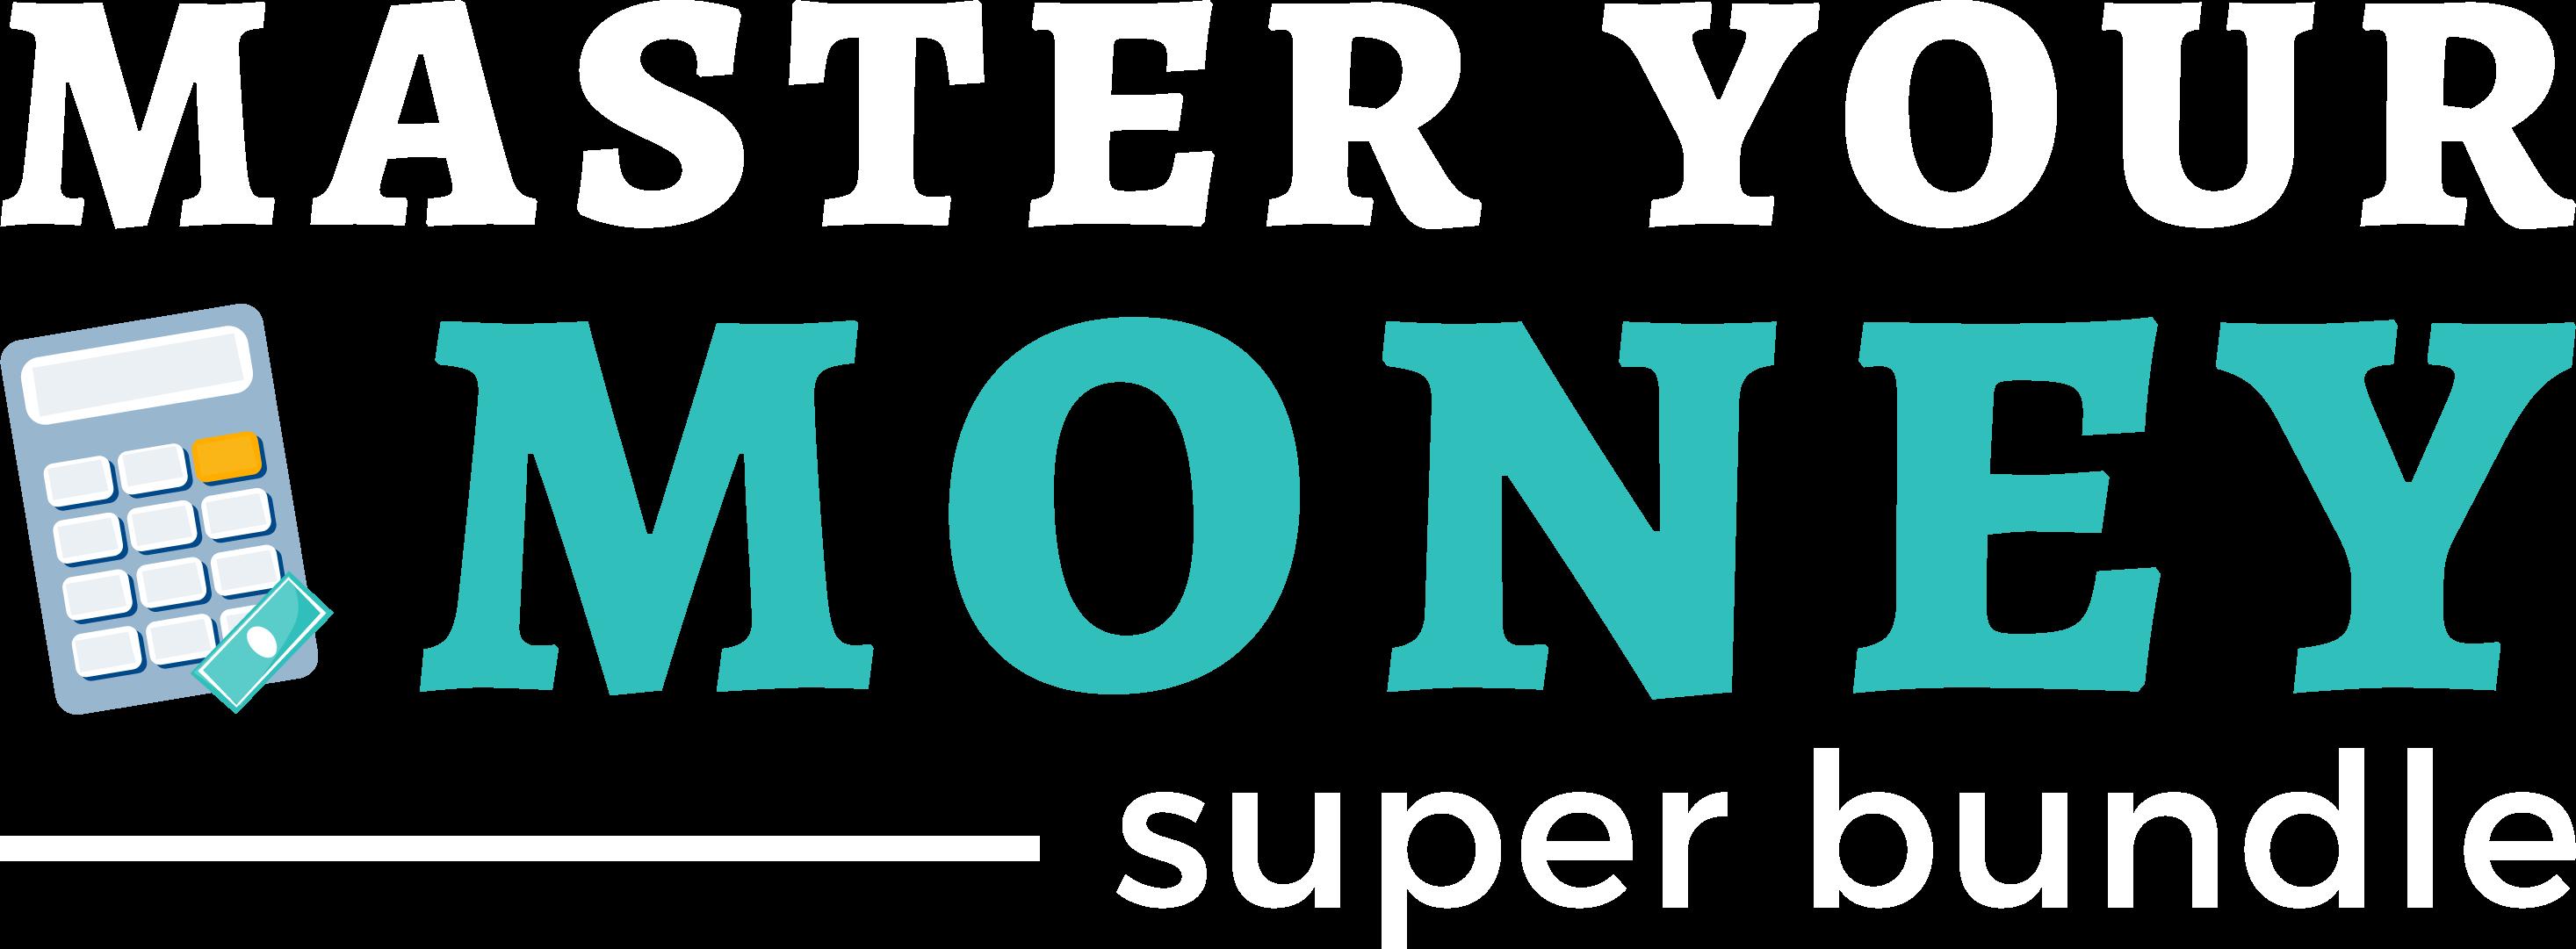 Master Your Money Super Bundle